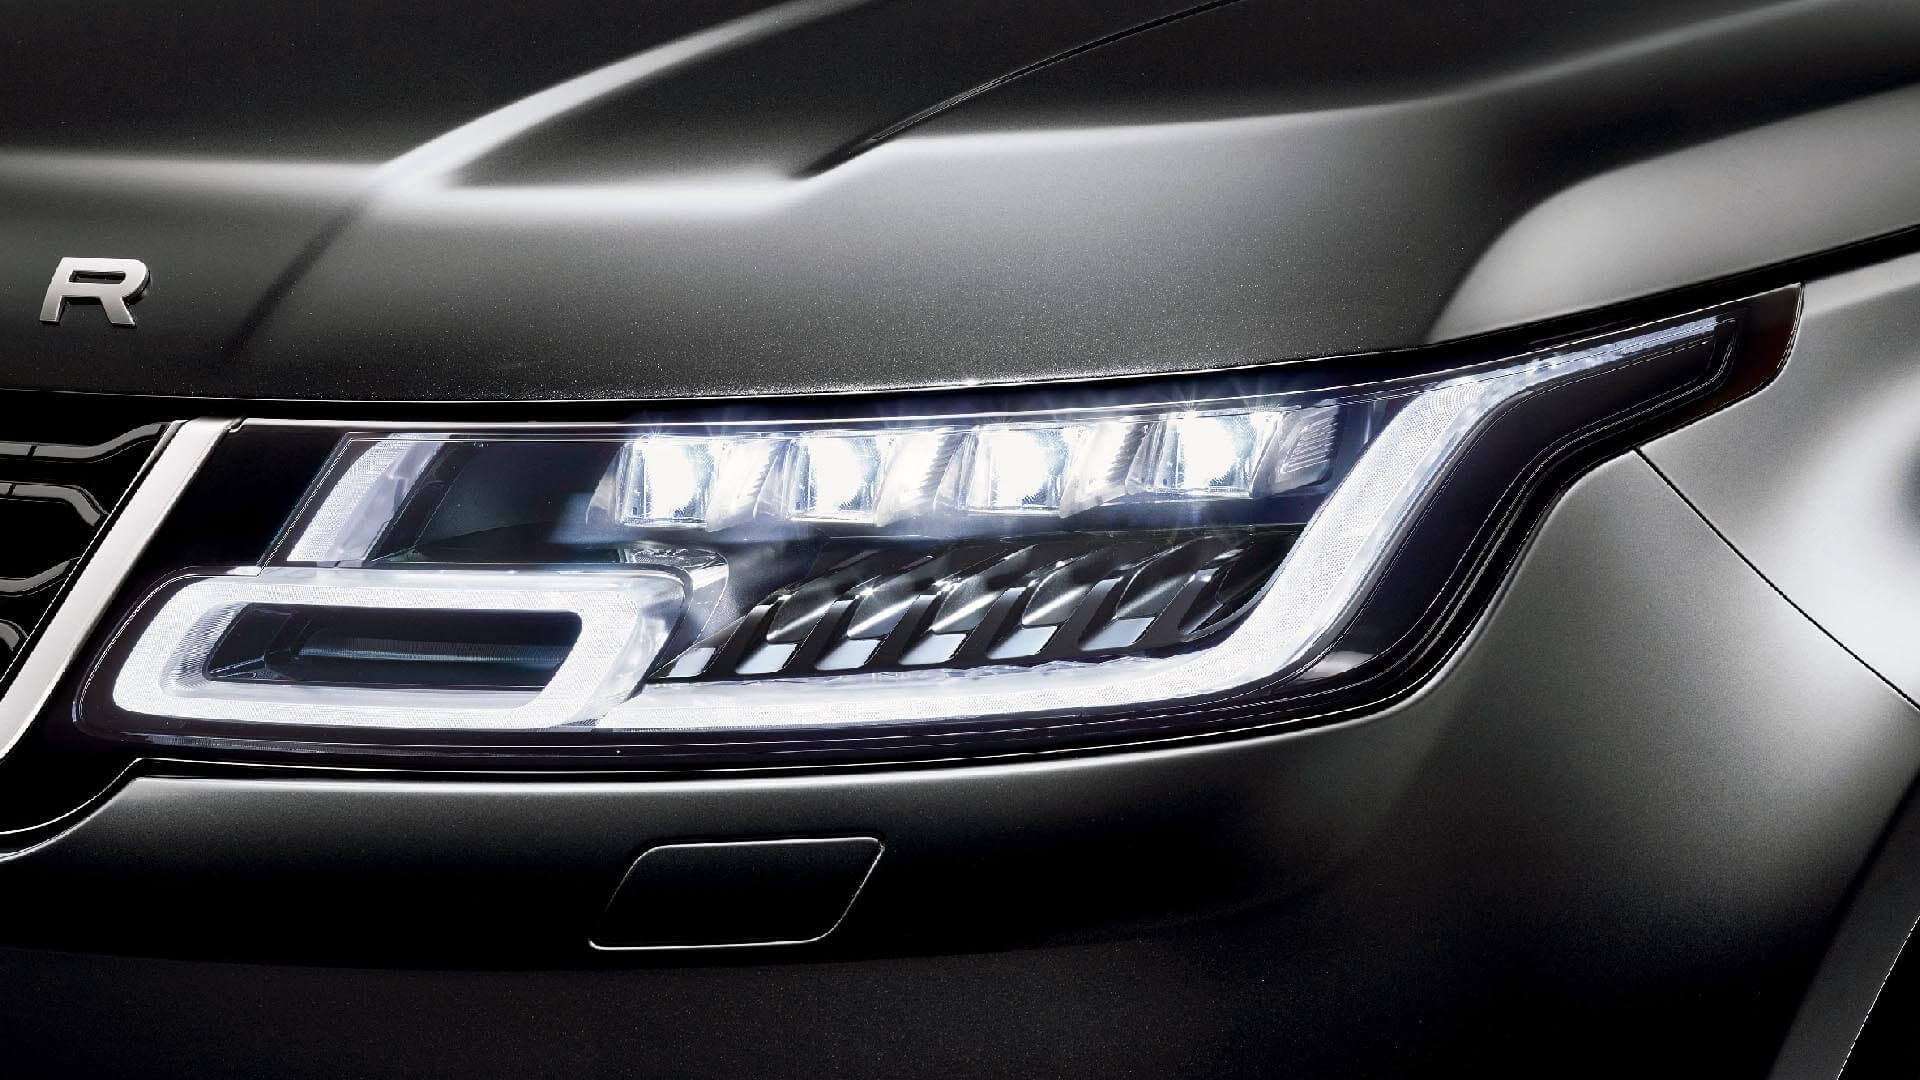 Range Rover Sport LED Matrix